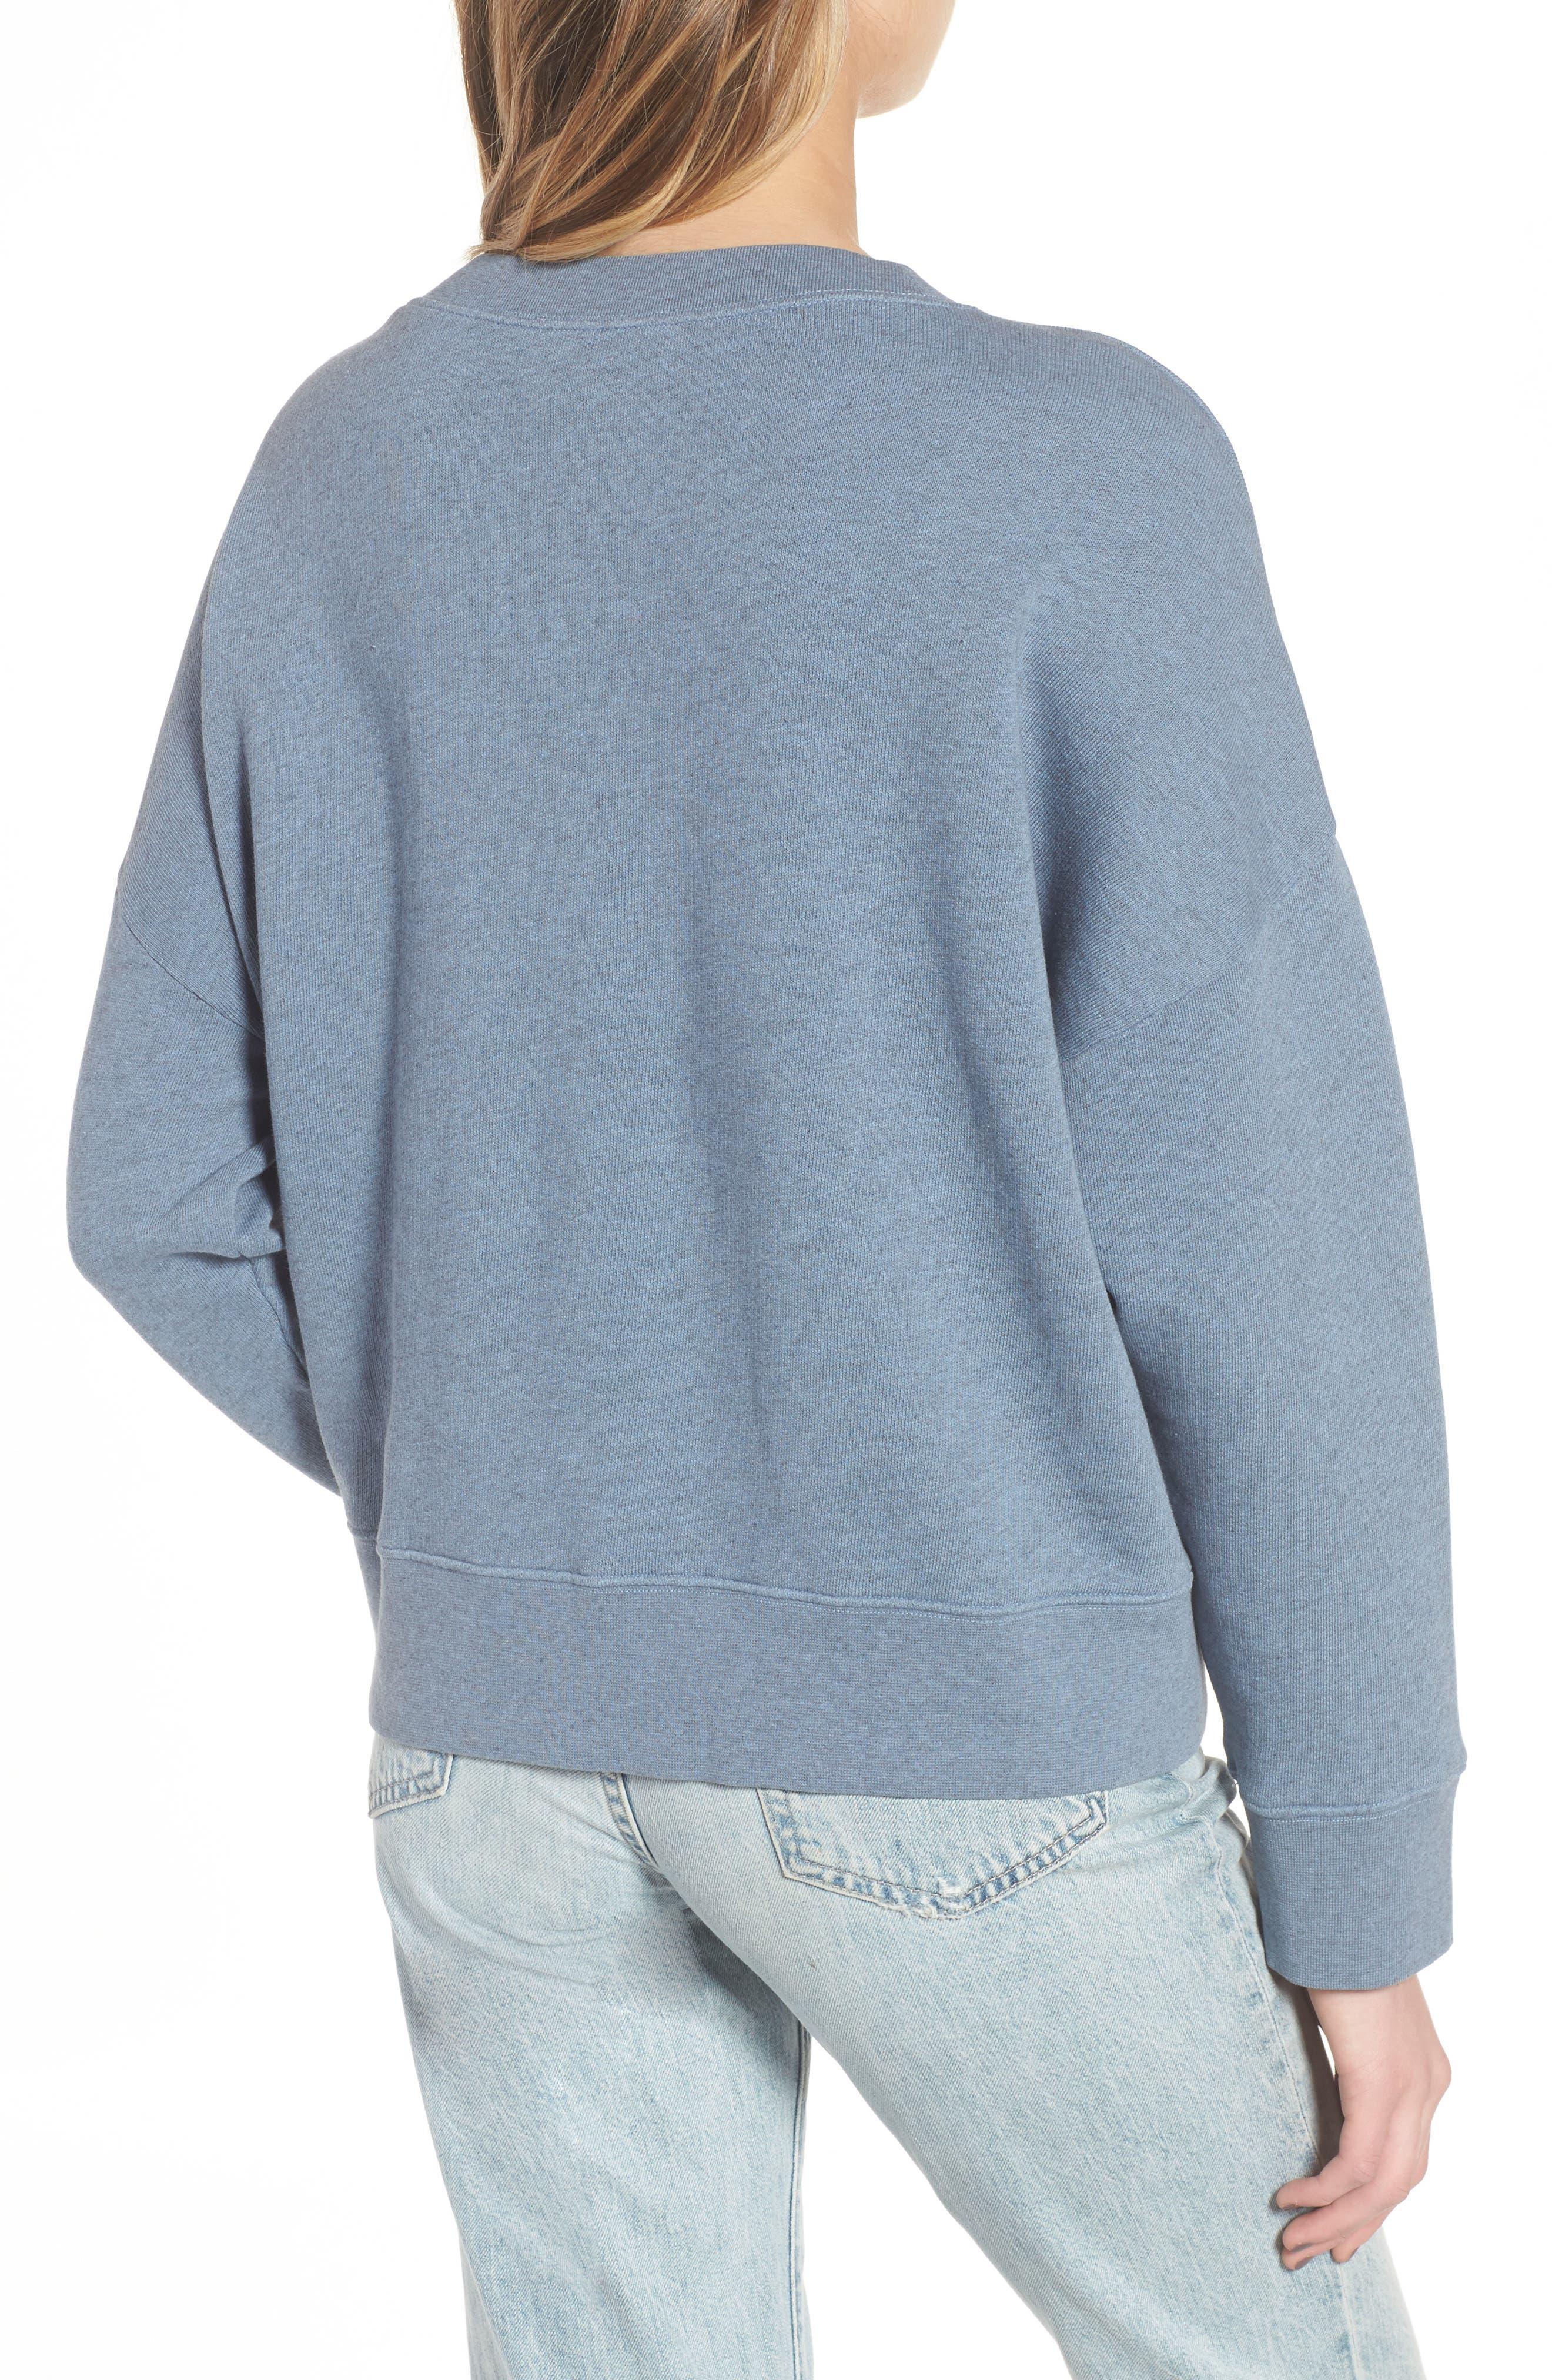 Kyoto Sweatshirt,                             Alternate thumbnail 2, color,                             400